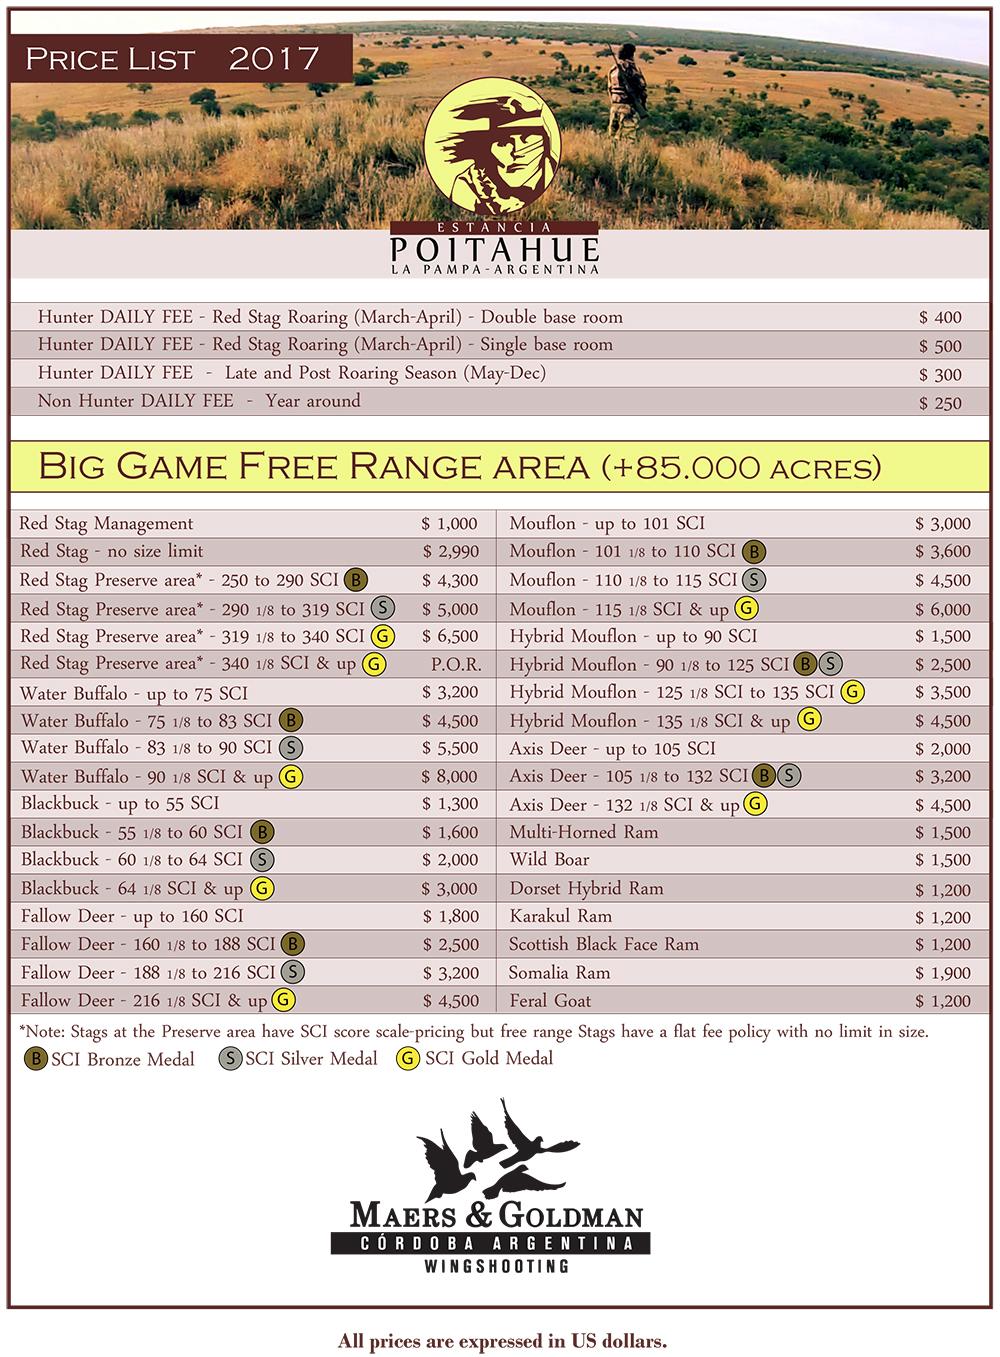 2017 Price List